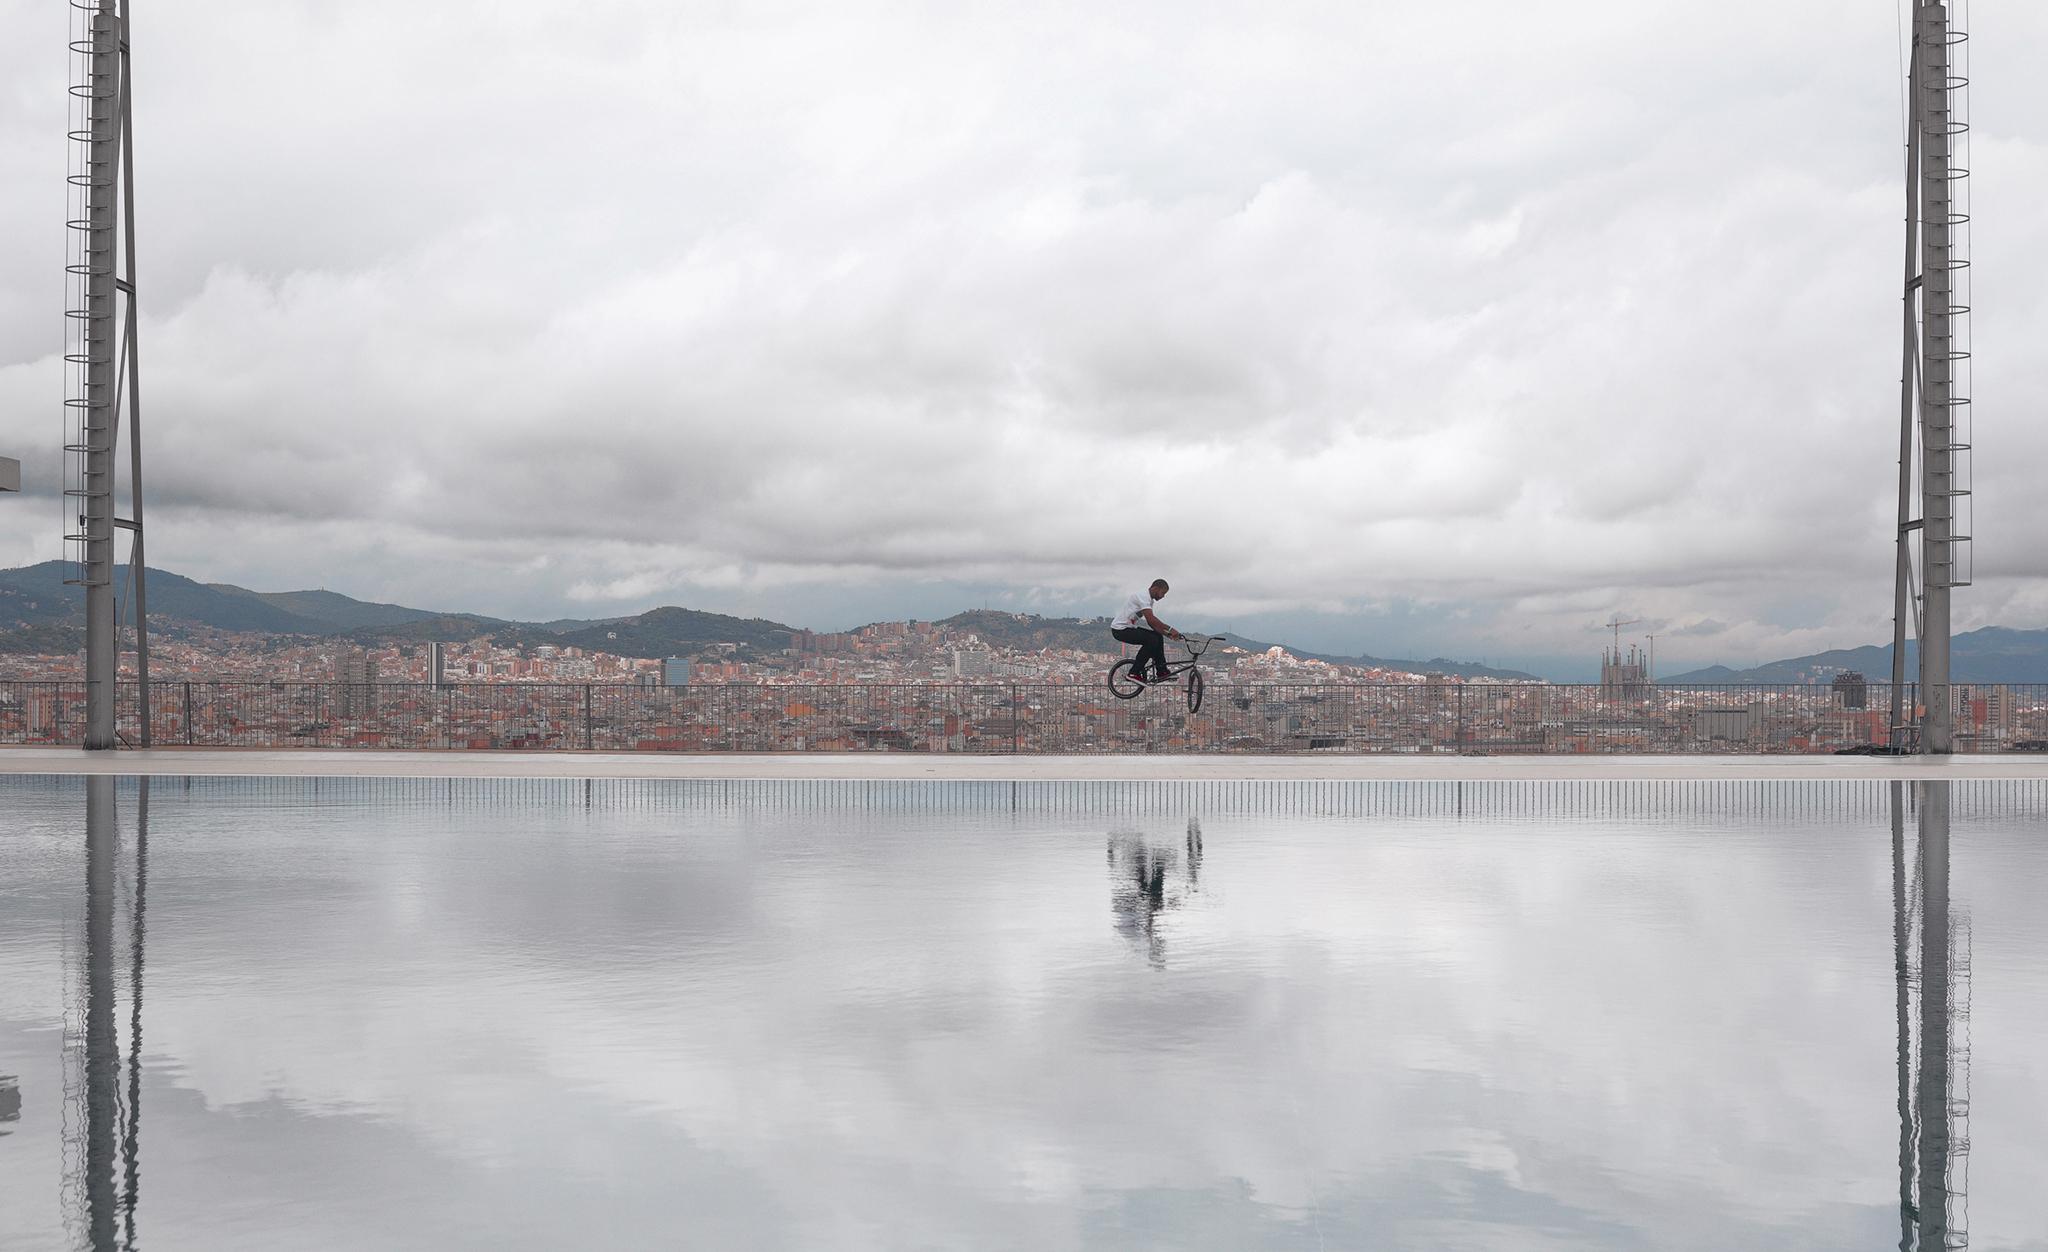 Mkel Larrin, Spain